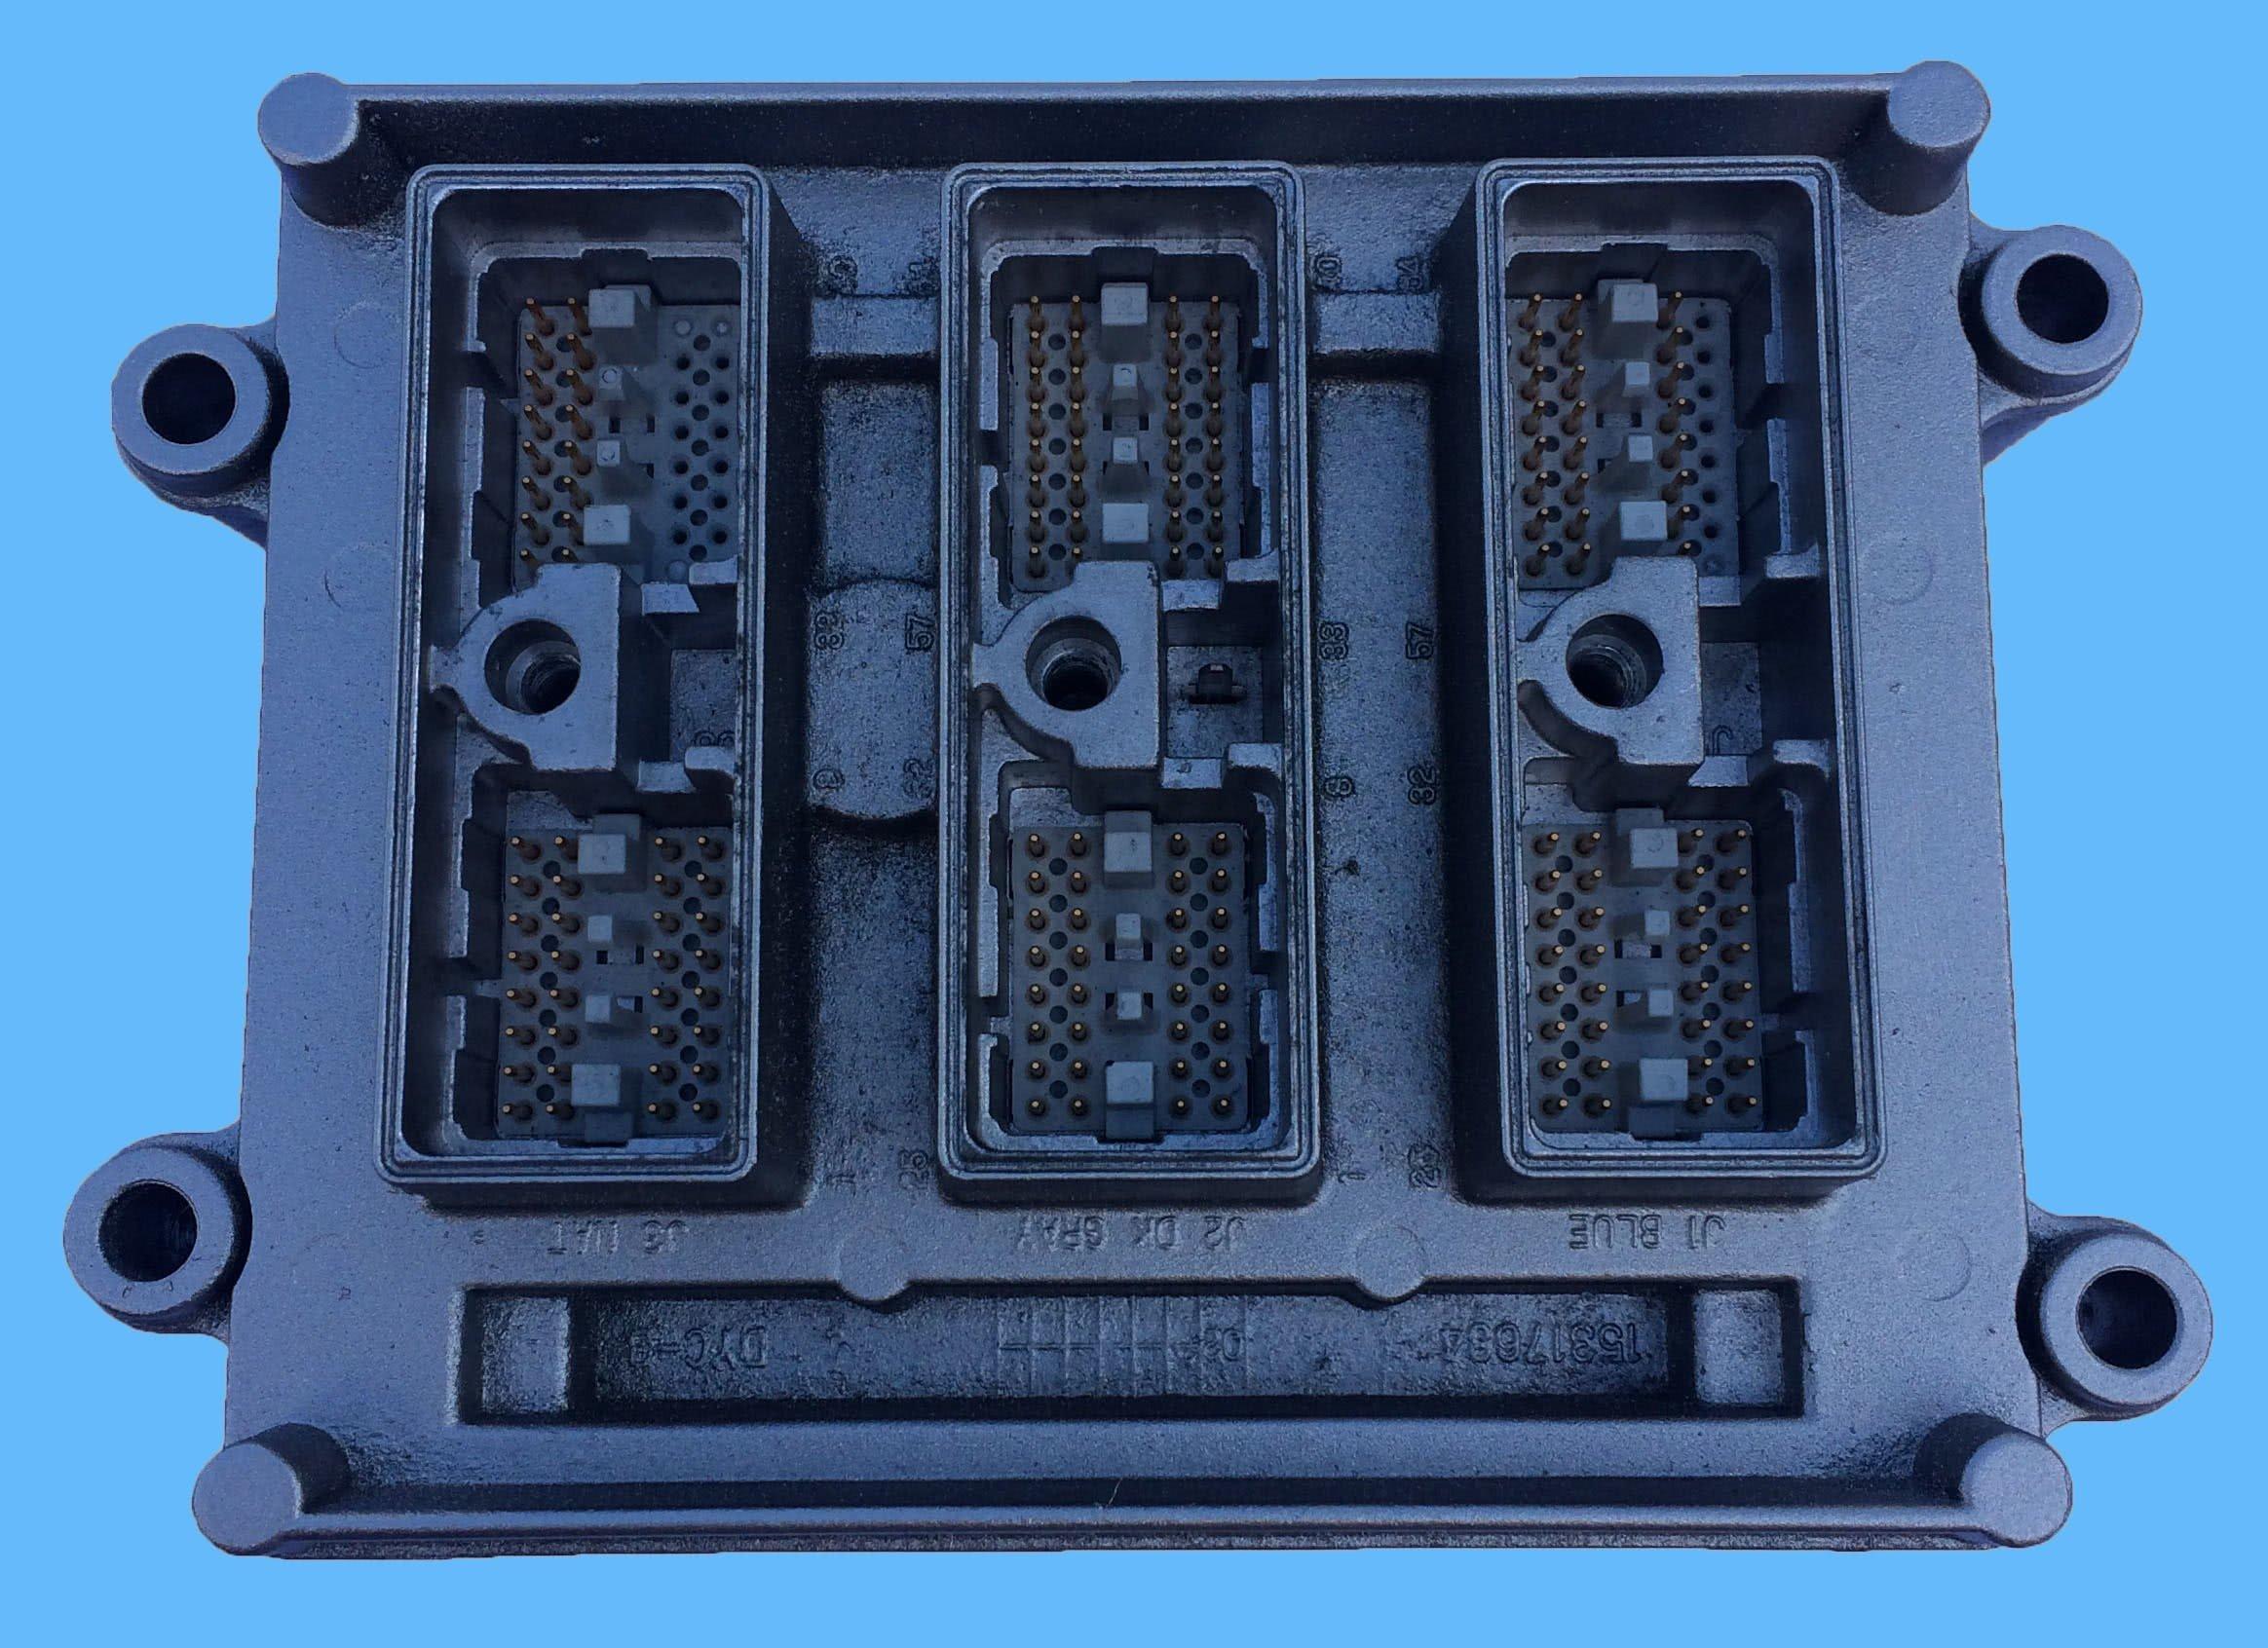 2005 Buick Rainier ECM 4.2L Gas Engine Control Module ECM / ECU - Engine Control Module